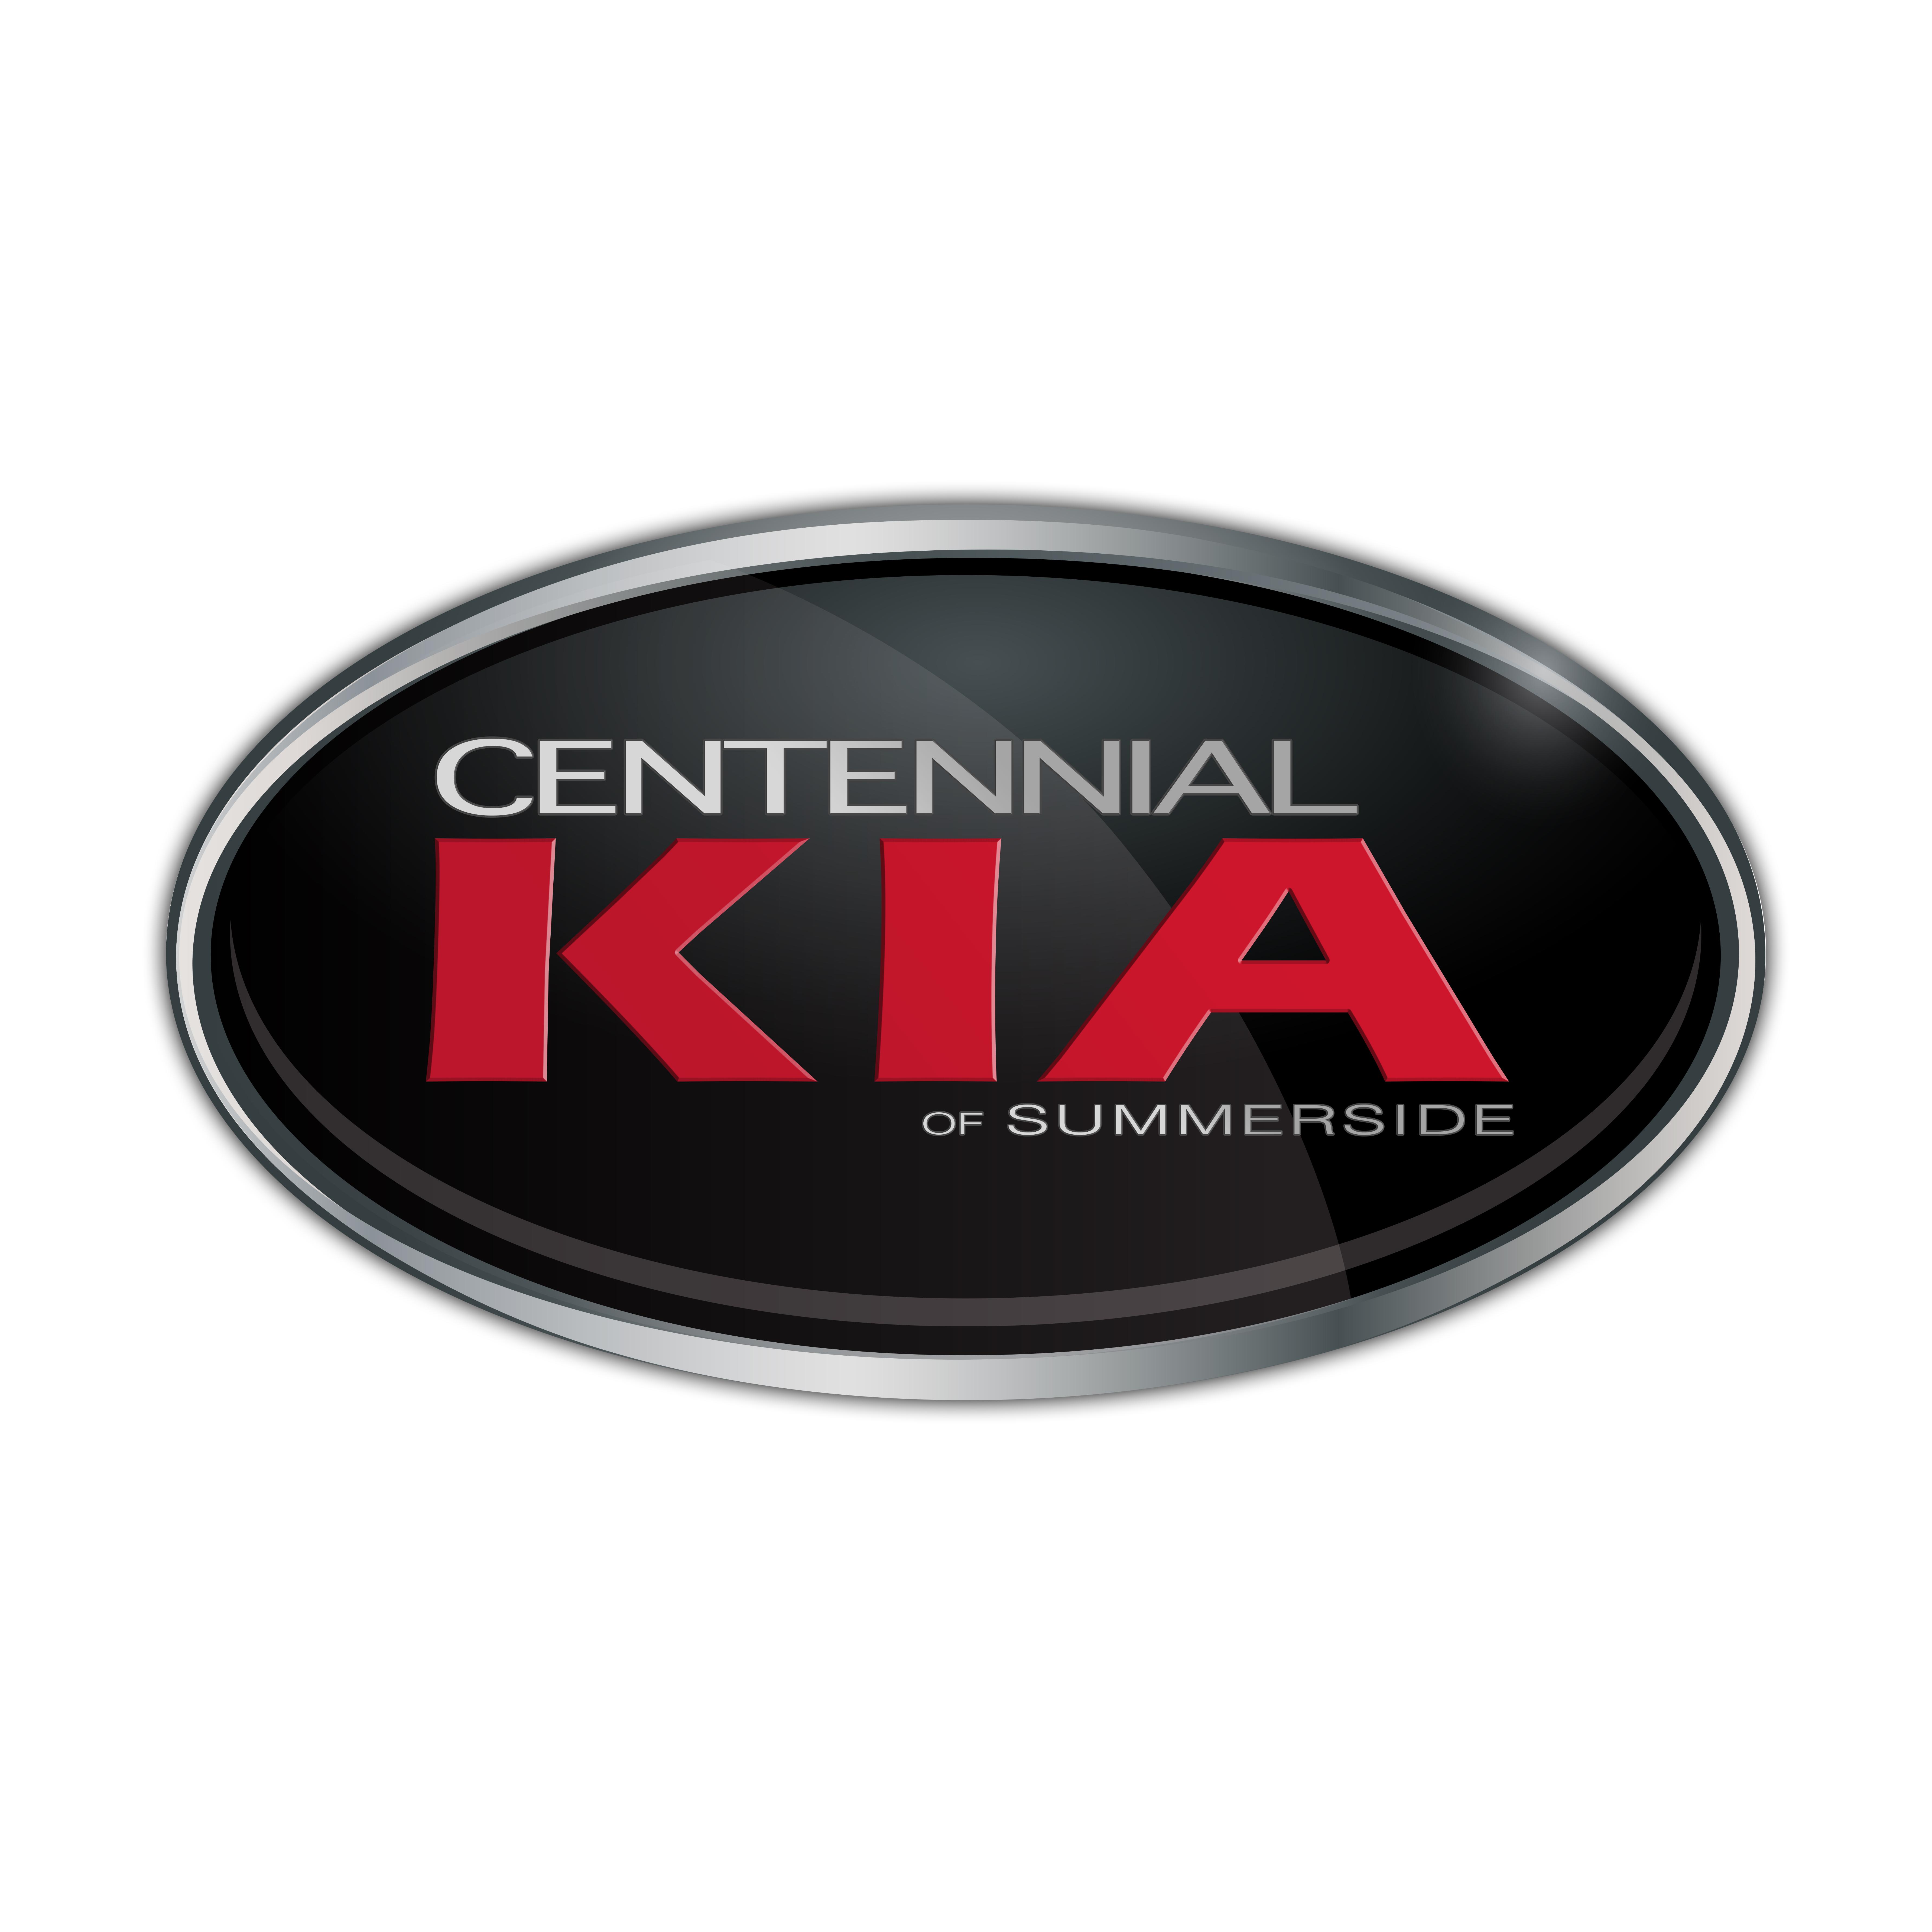 Centennial Kia of Summerside